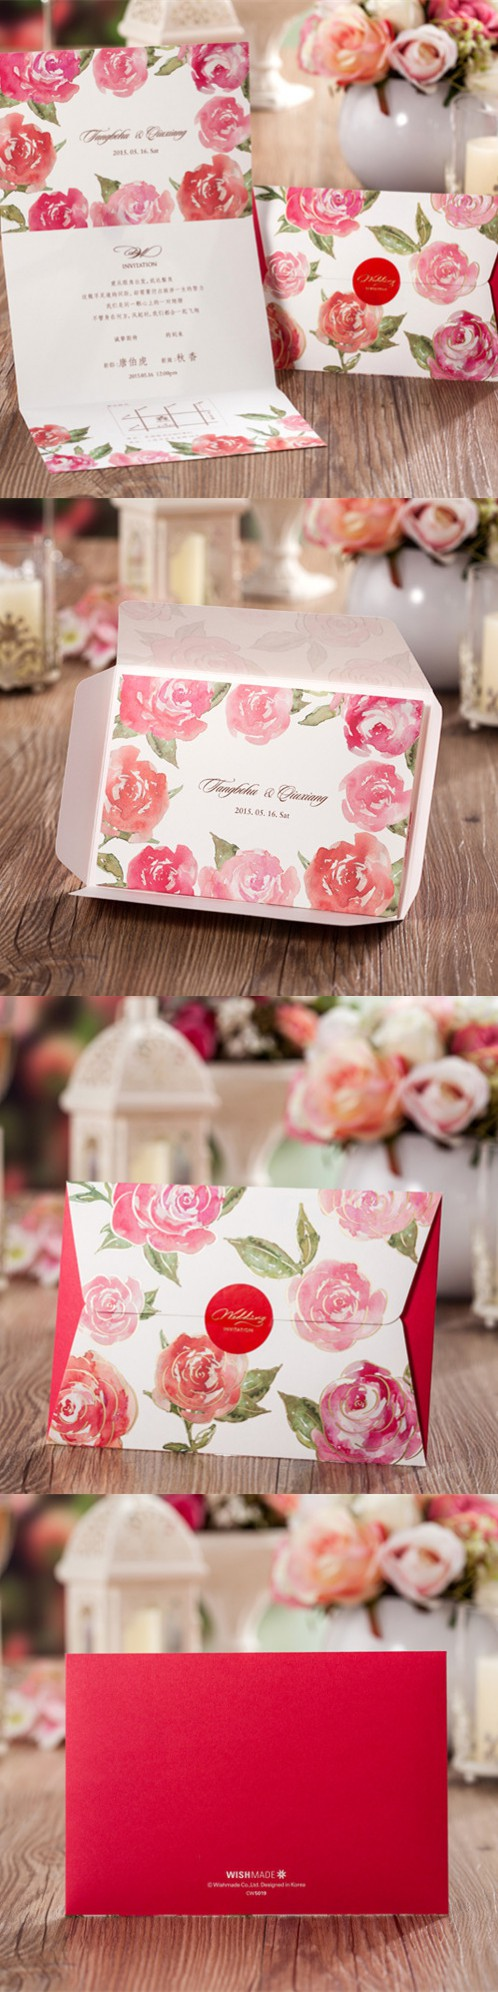 50 Sets Envelope Shape Red Rose Romantic Invitation Card For Wedding ...